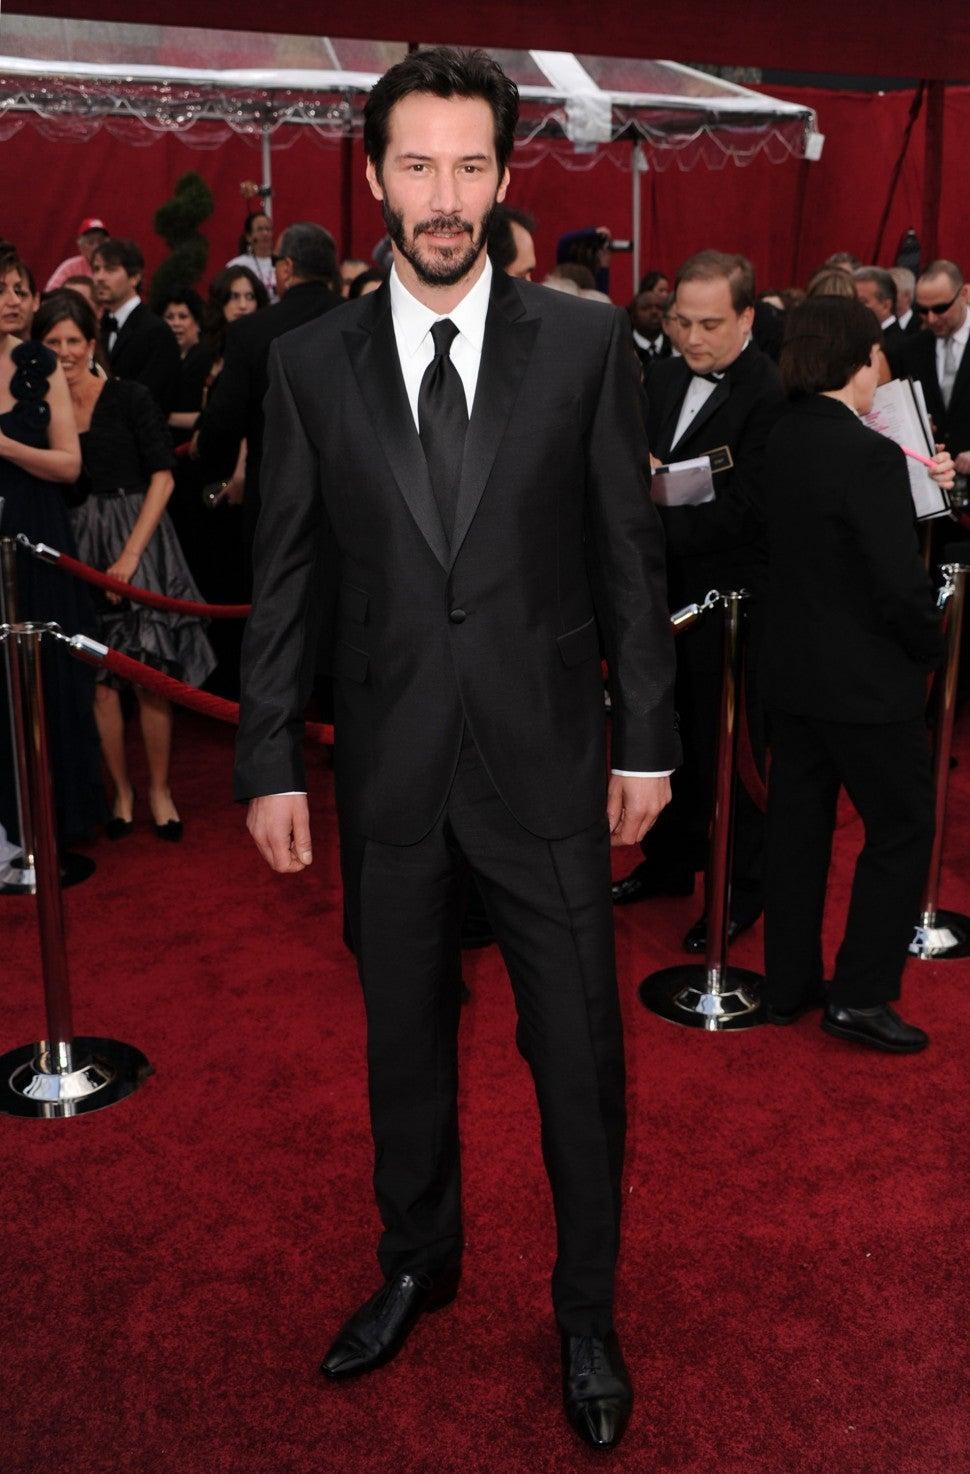 Keanu Reeves at 2010 Oscars